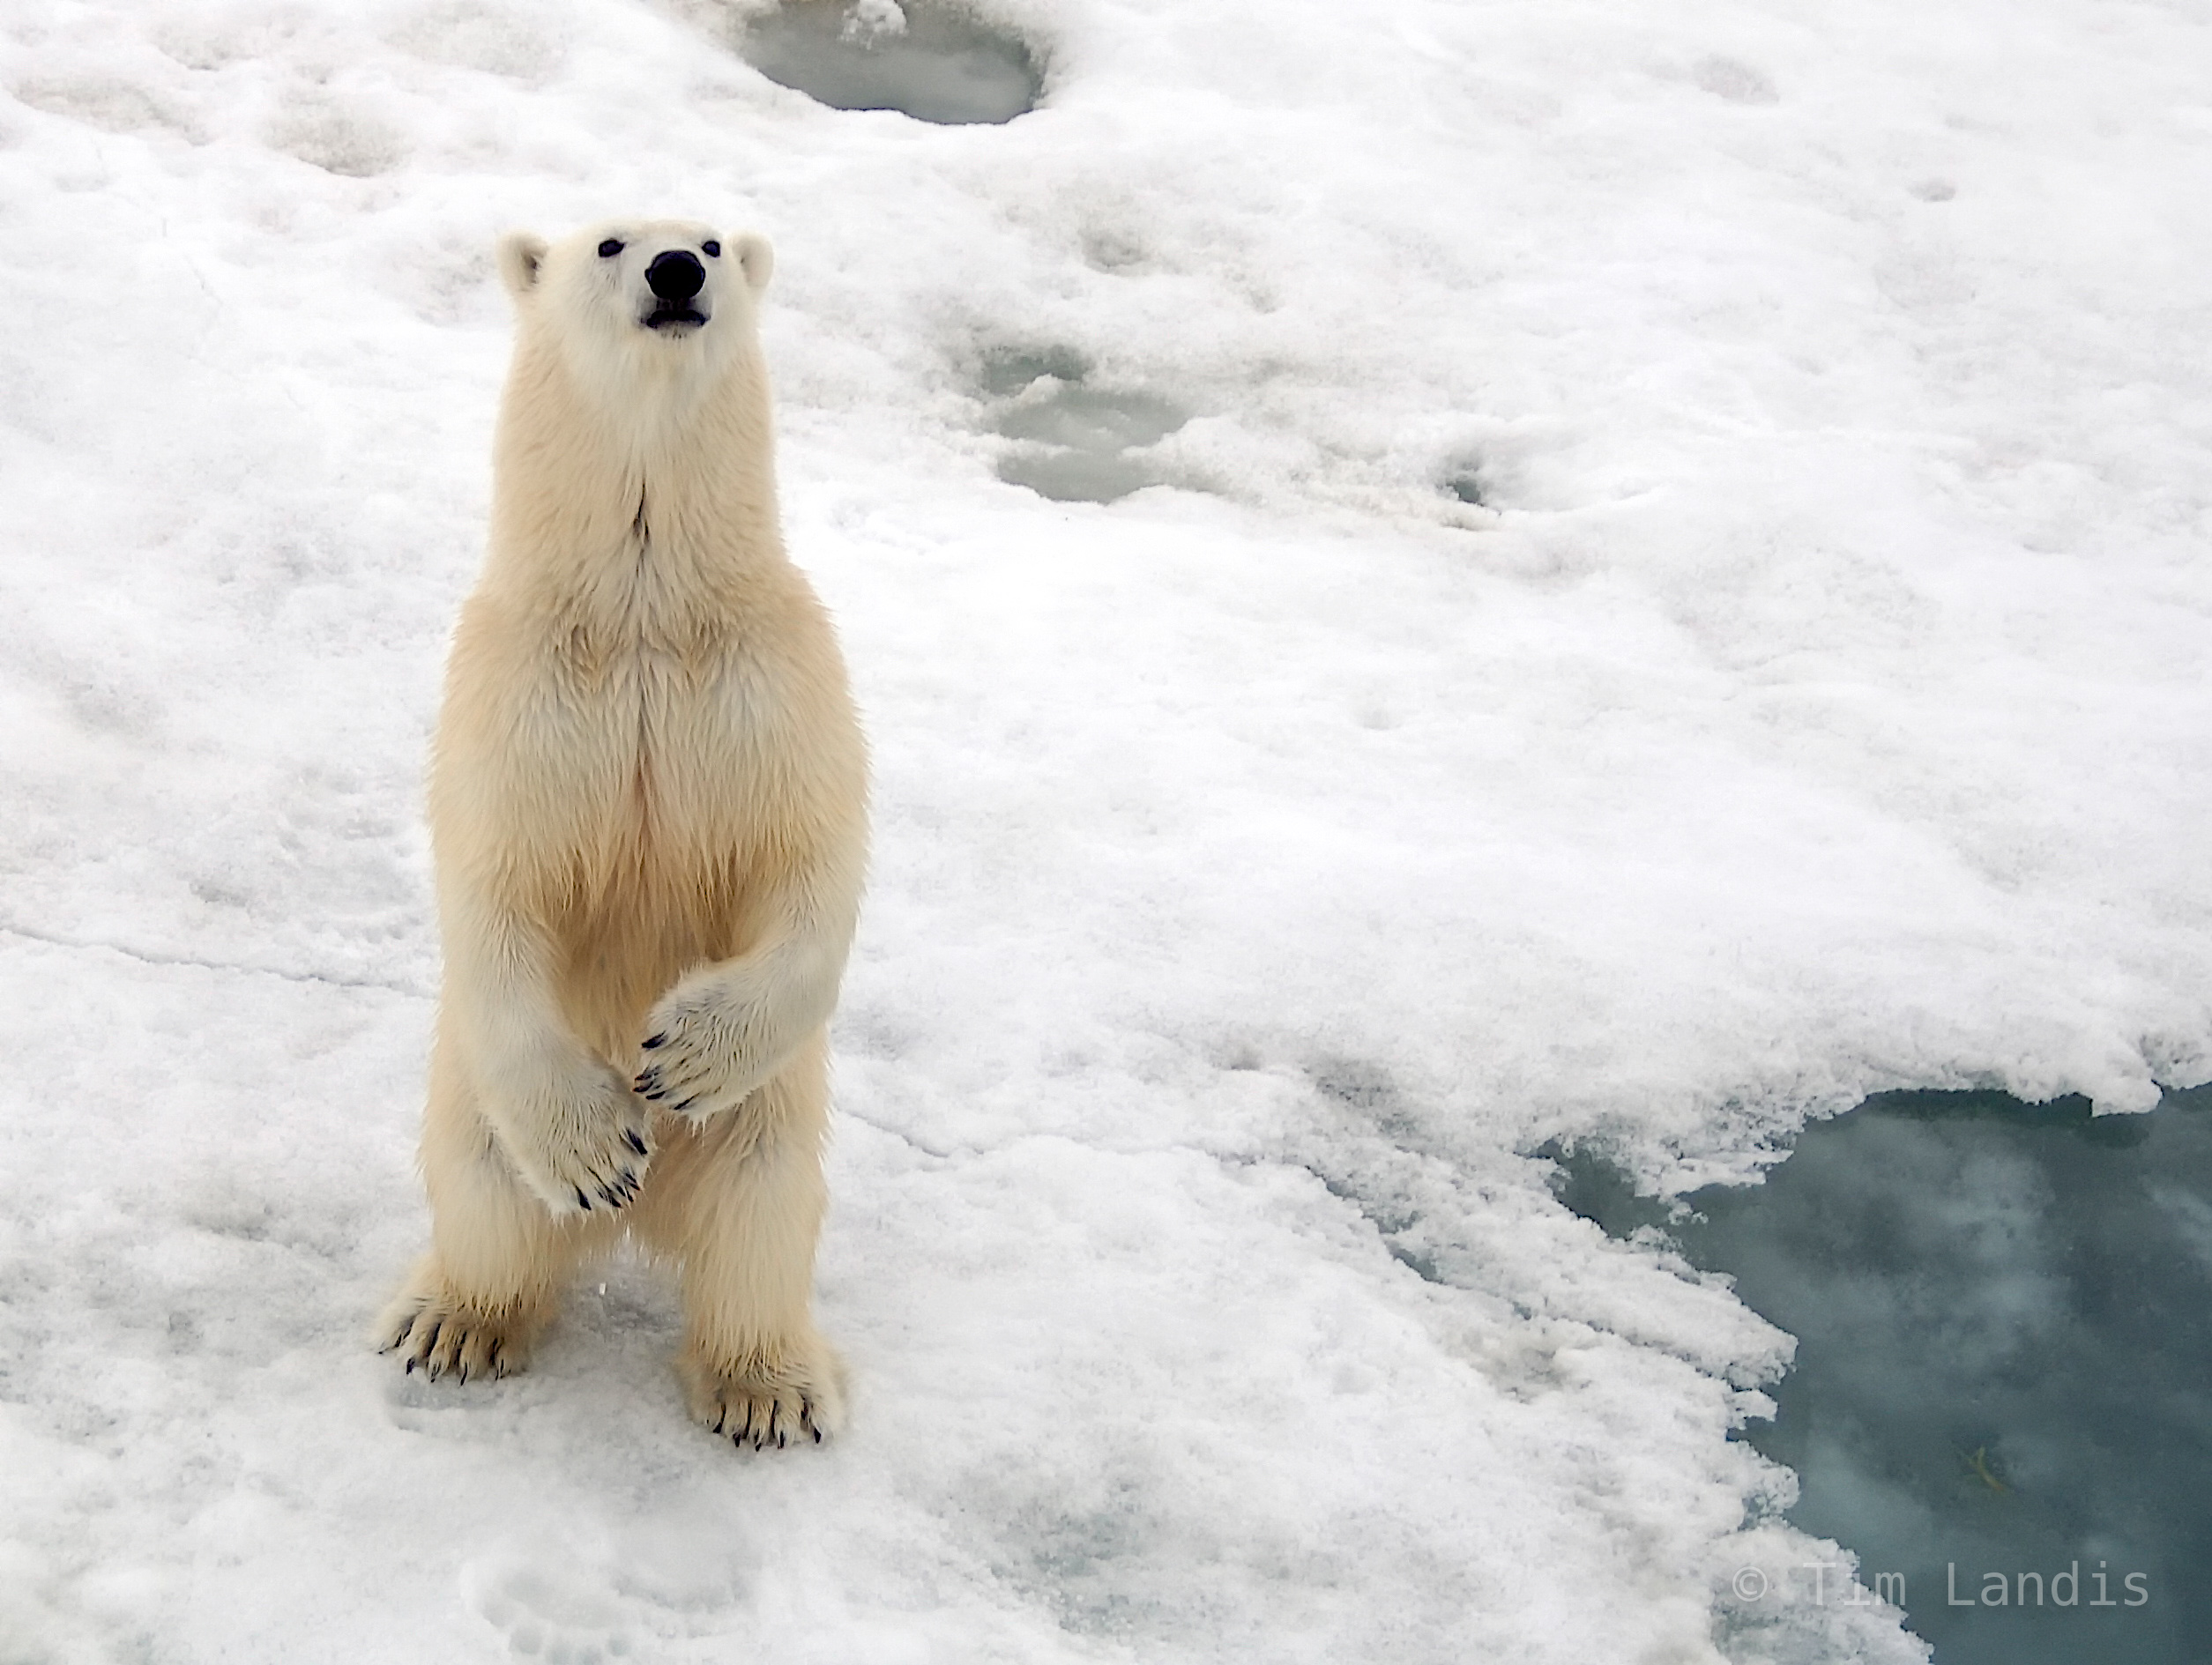 North Pole, ice flow, polar bear on ice berg, photo